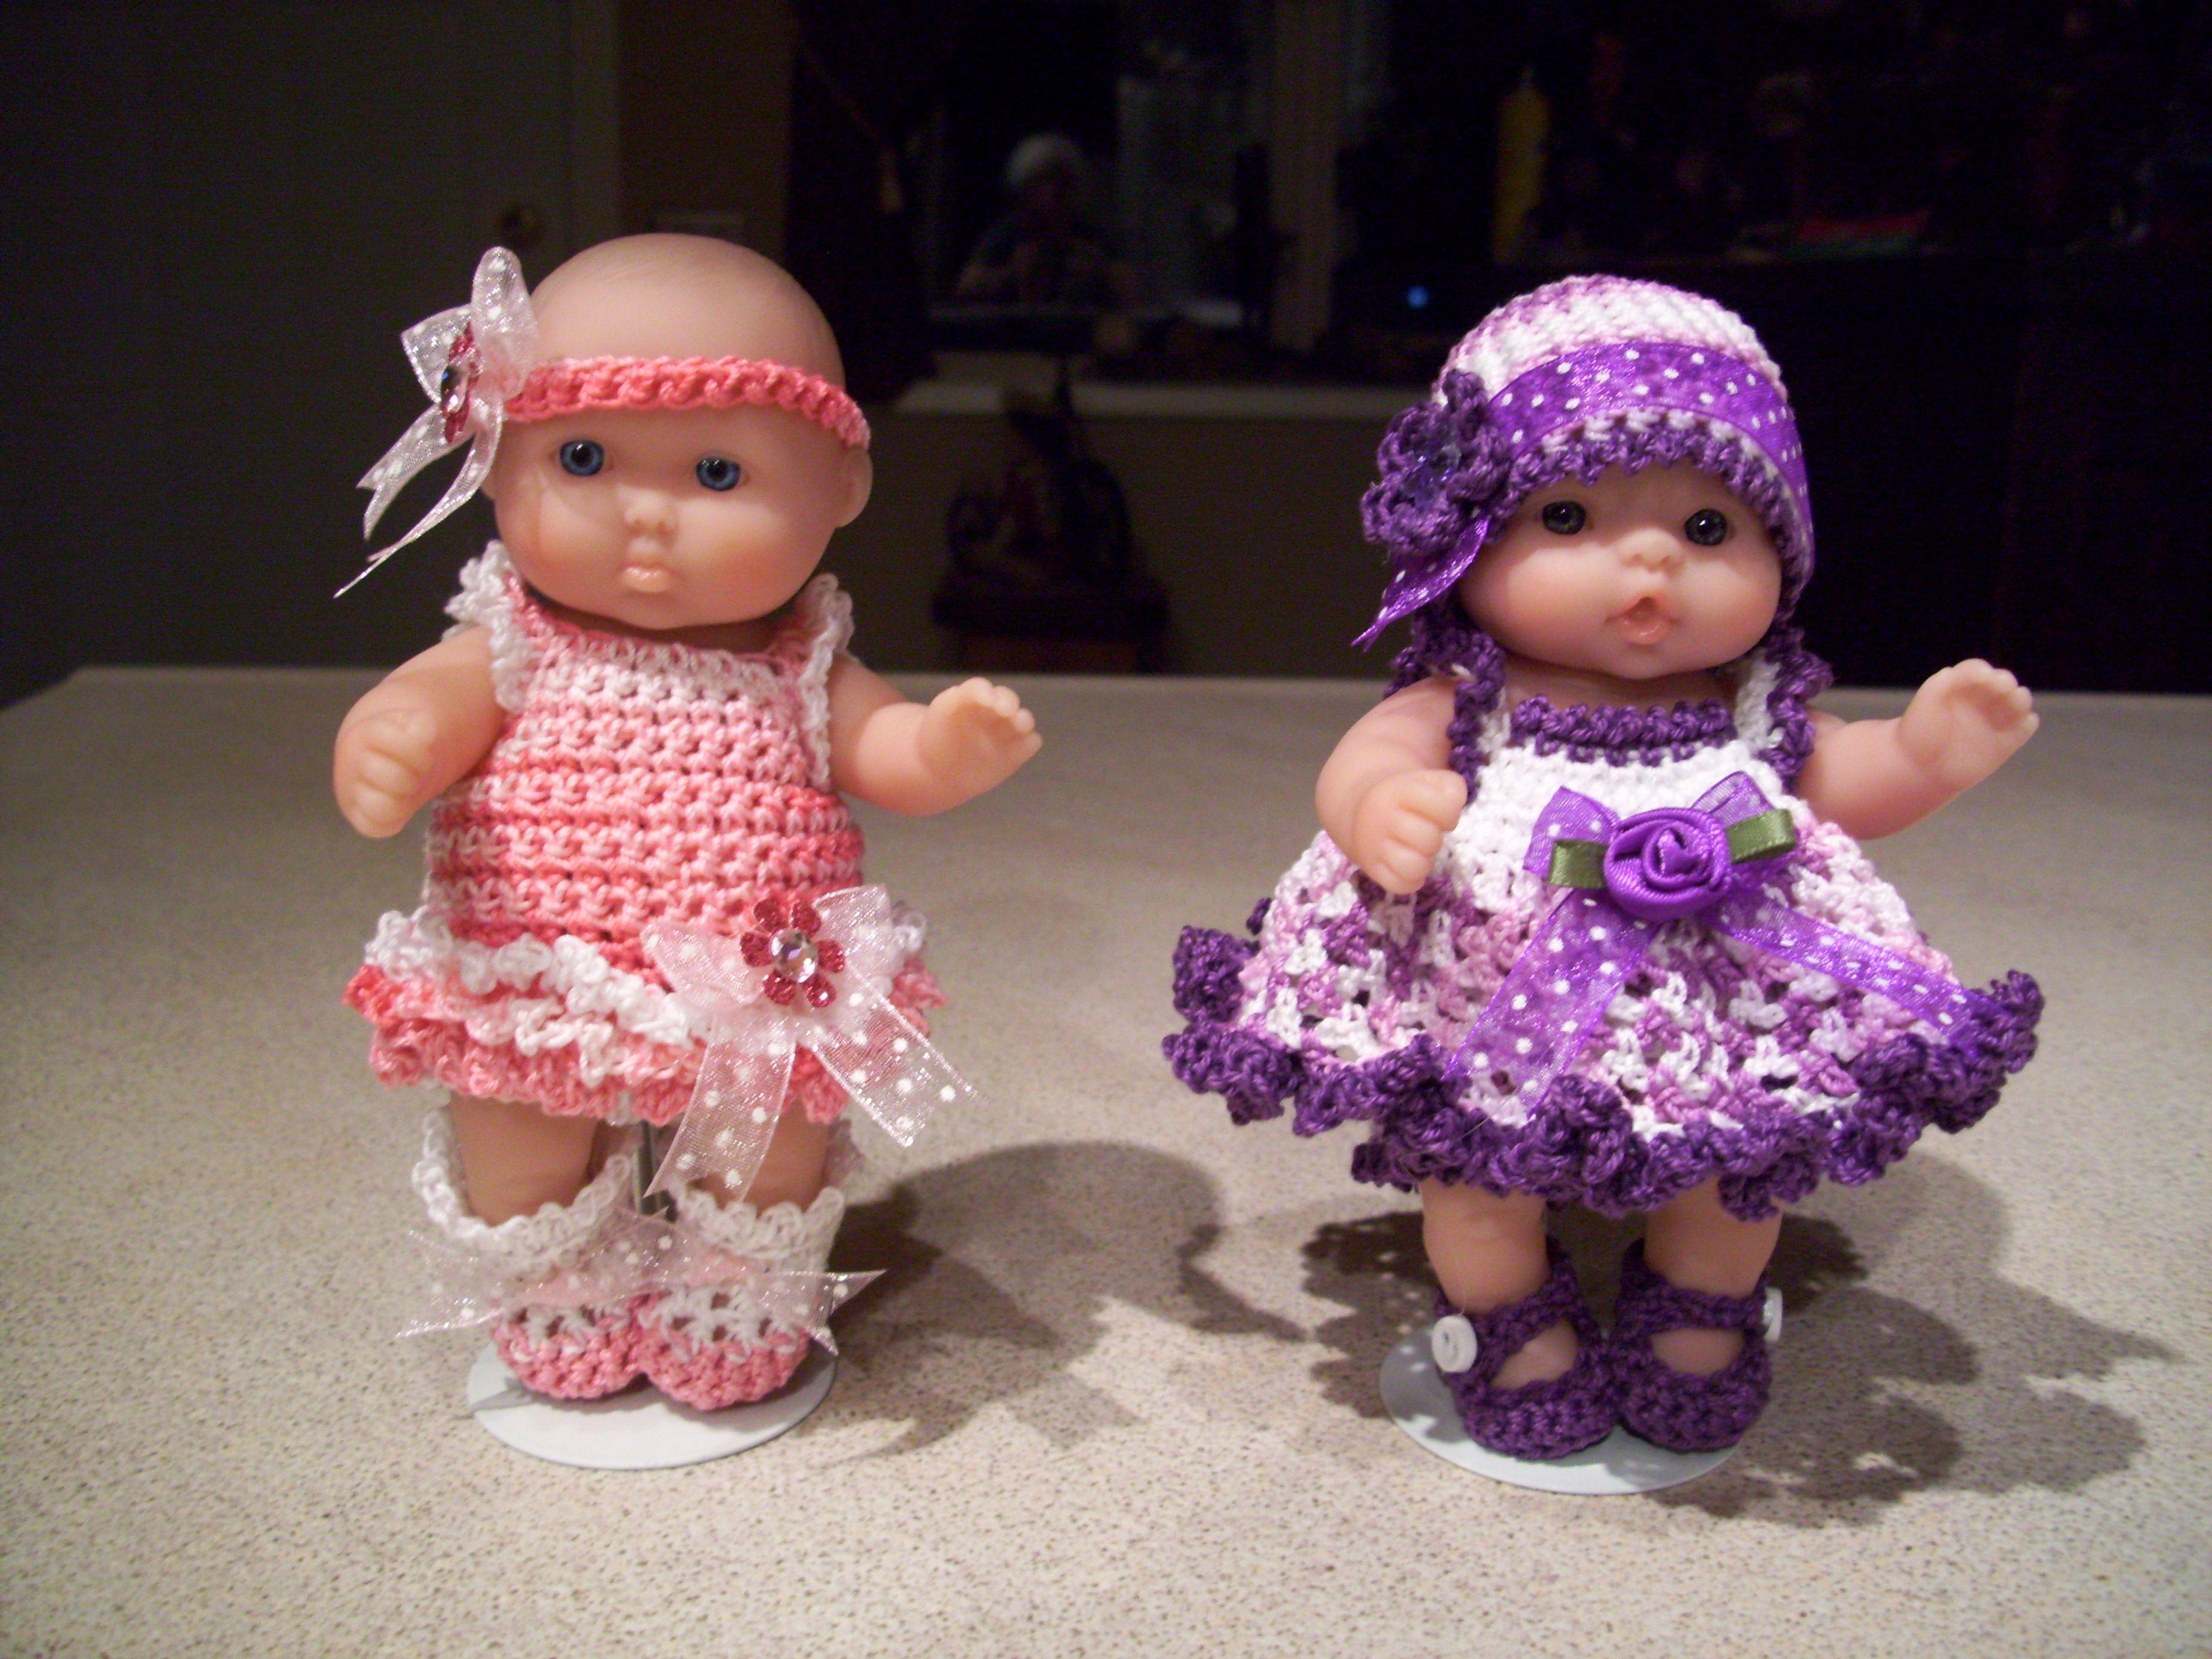 "Pin by Jana Langley on Dolls Berenguer 5"" Dolls Itty Bitty Dolls"